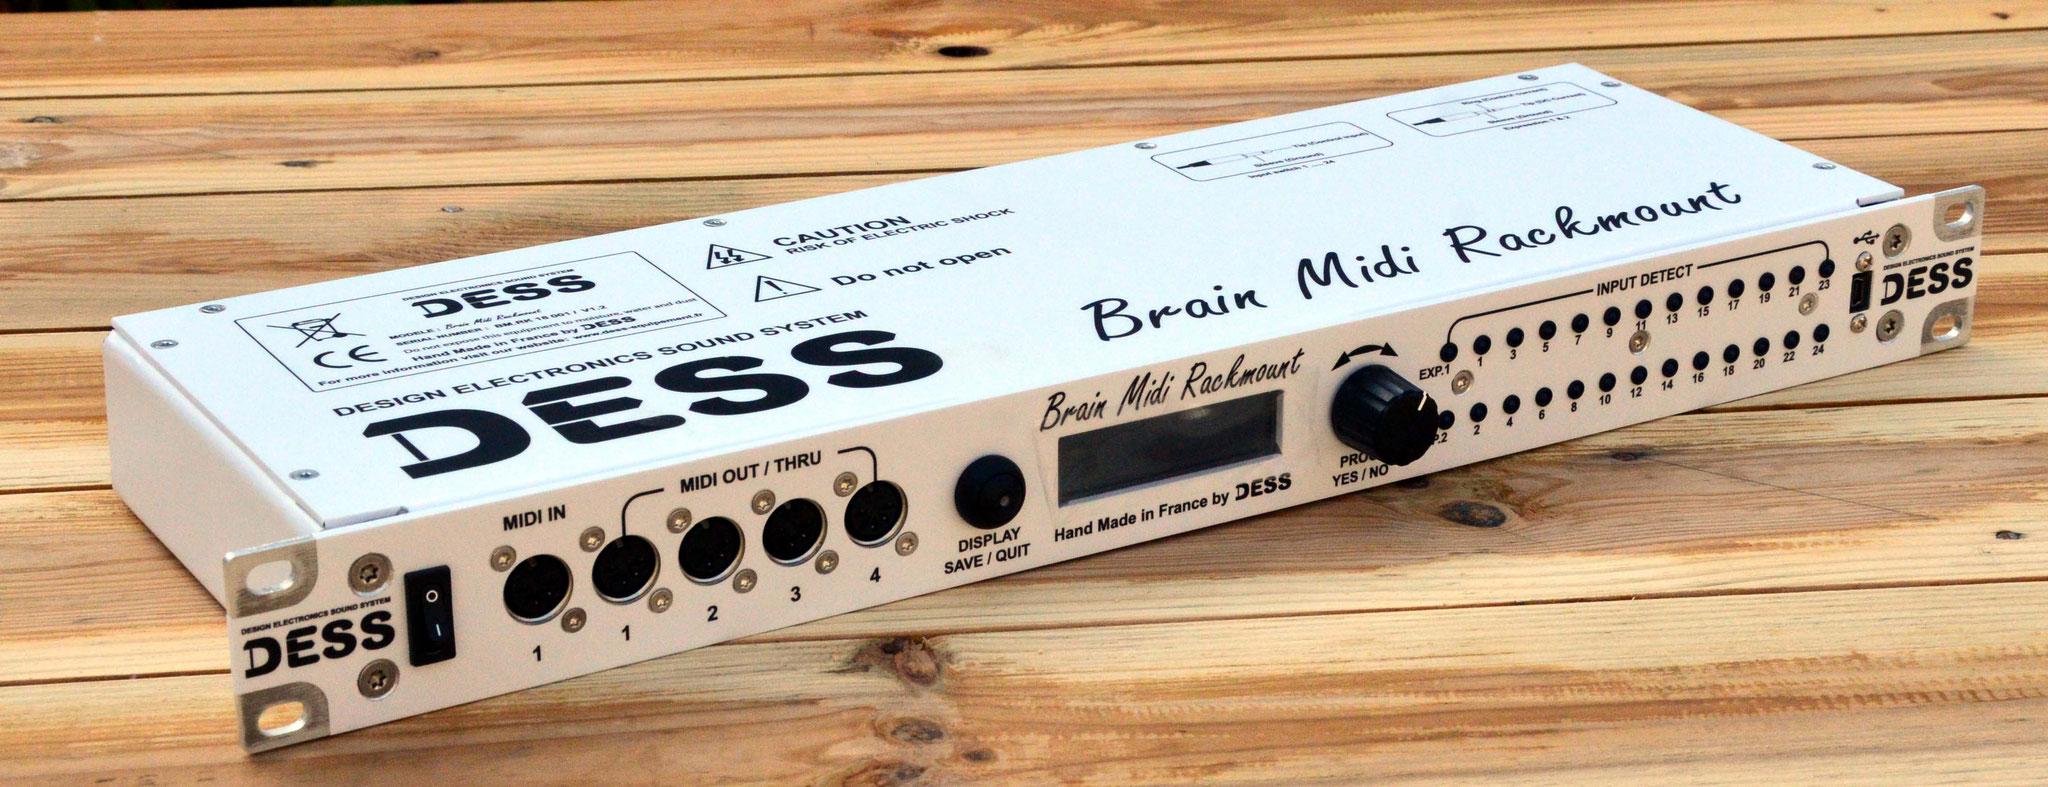 Brain Midi Rackmount V1, 2018 Jean Louis Aubert